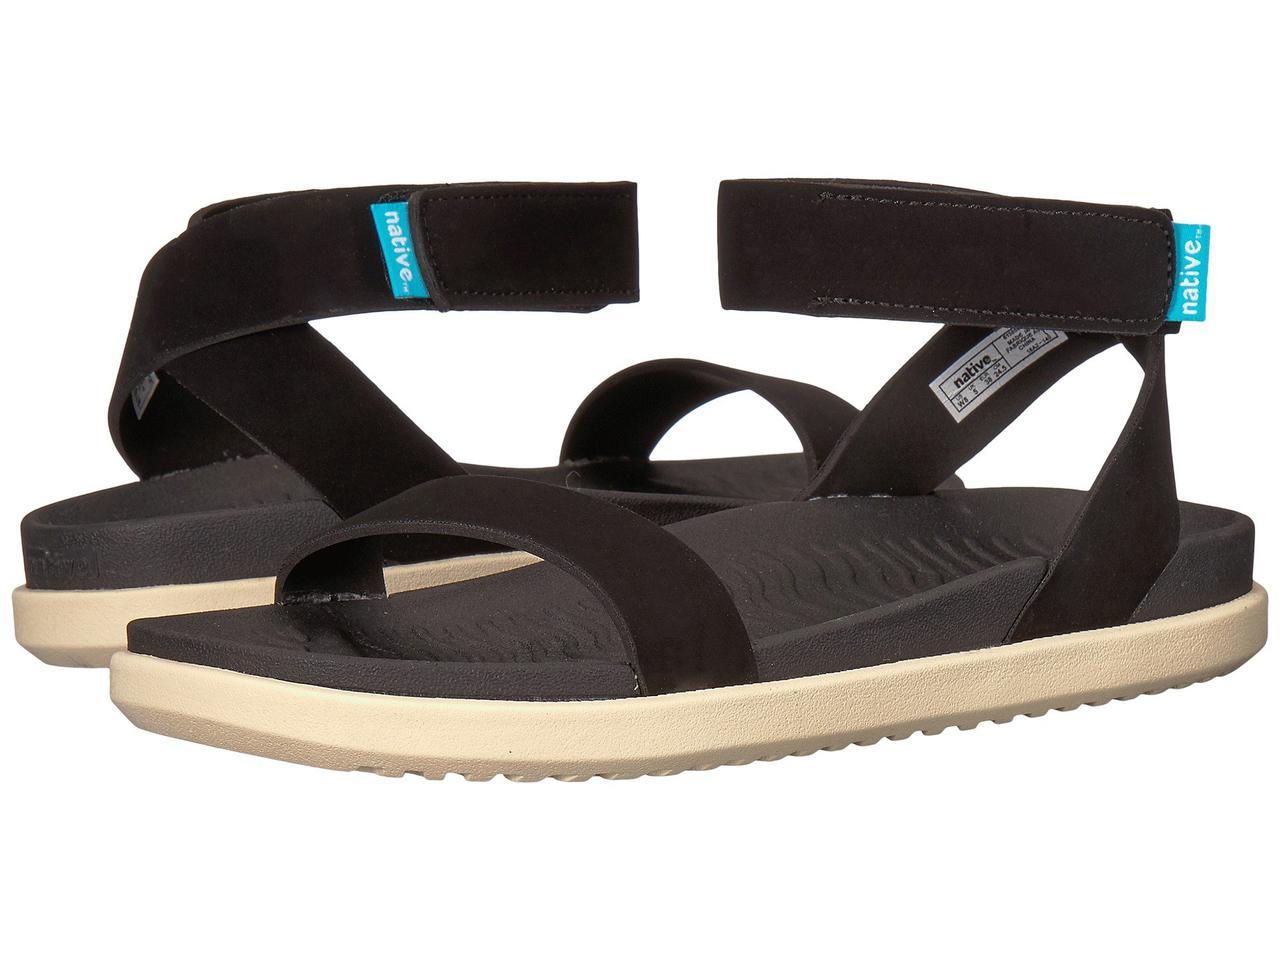 Сандали/Вьетнамки (Оригинал) Native Shoes Juliet Jiffy Black/Bone White